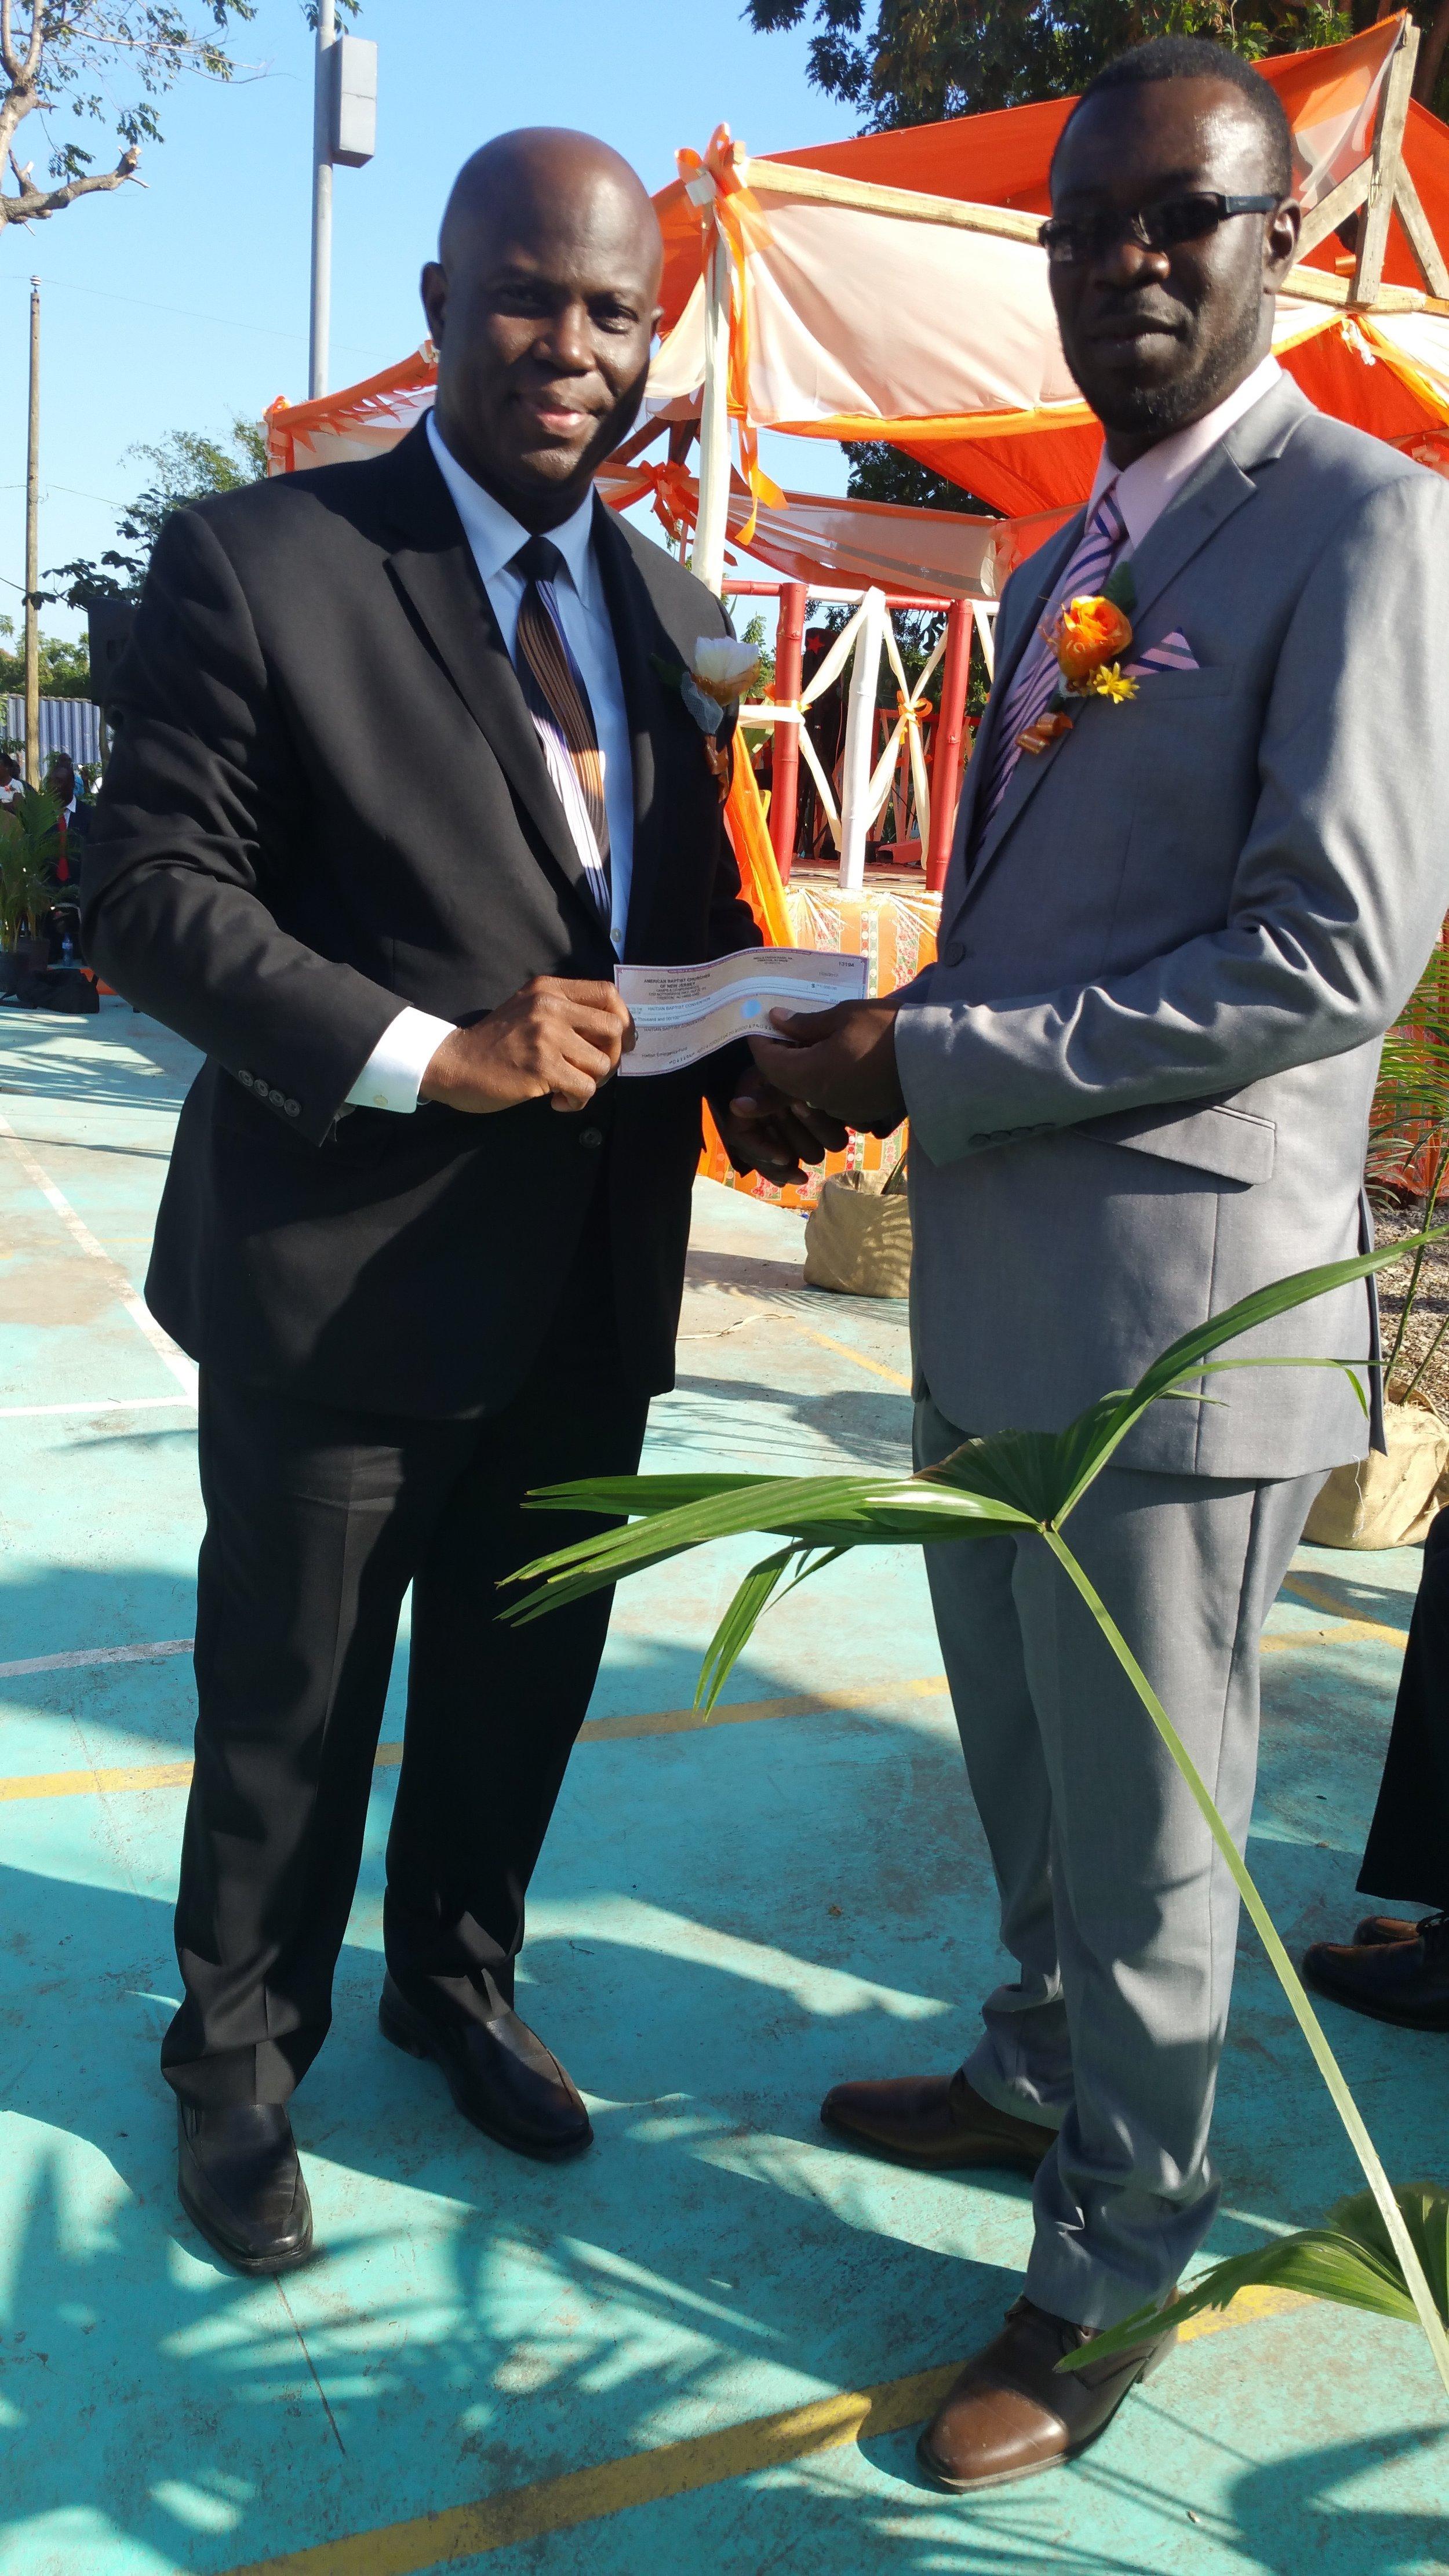 ABCNJ provides a $1,000 donation to Haitian Baptist Hospital.